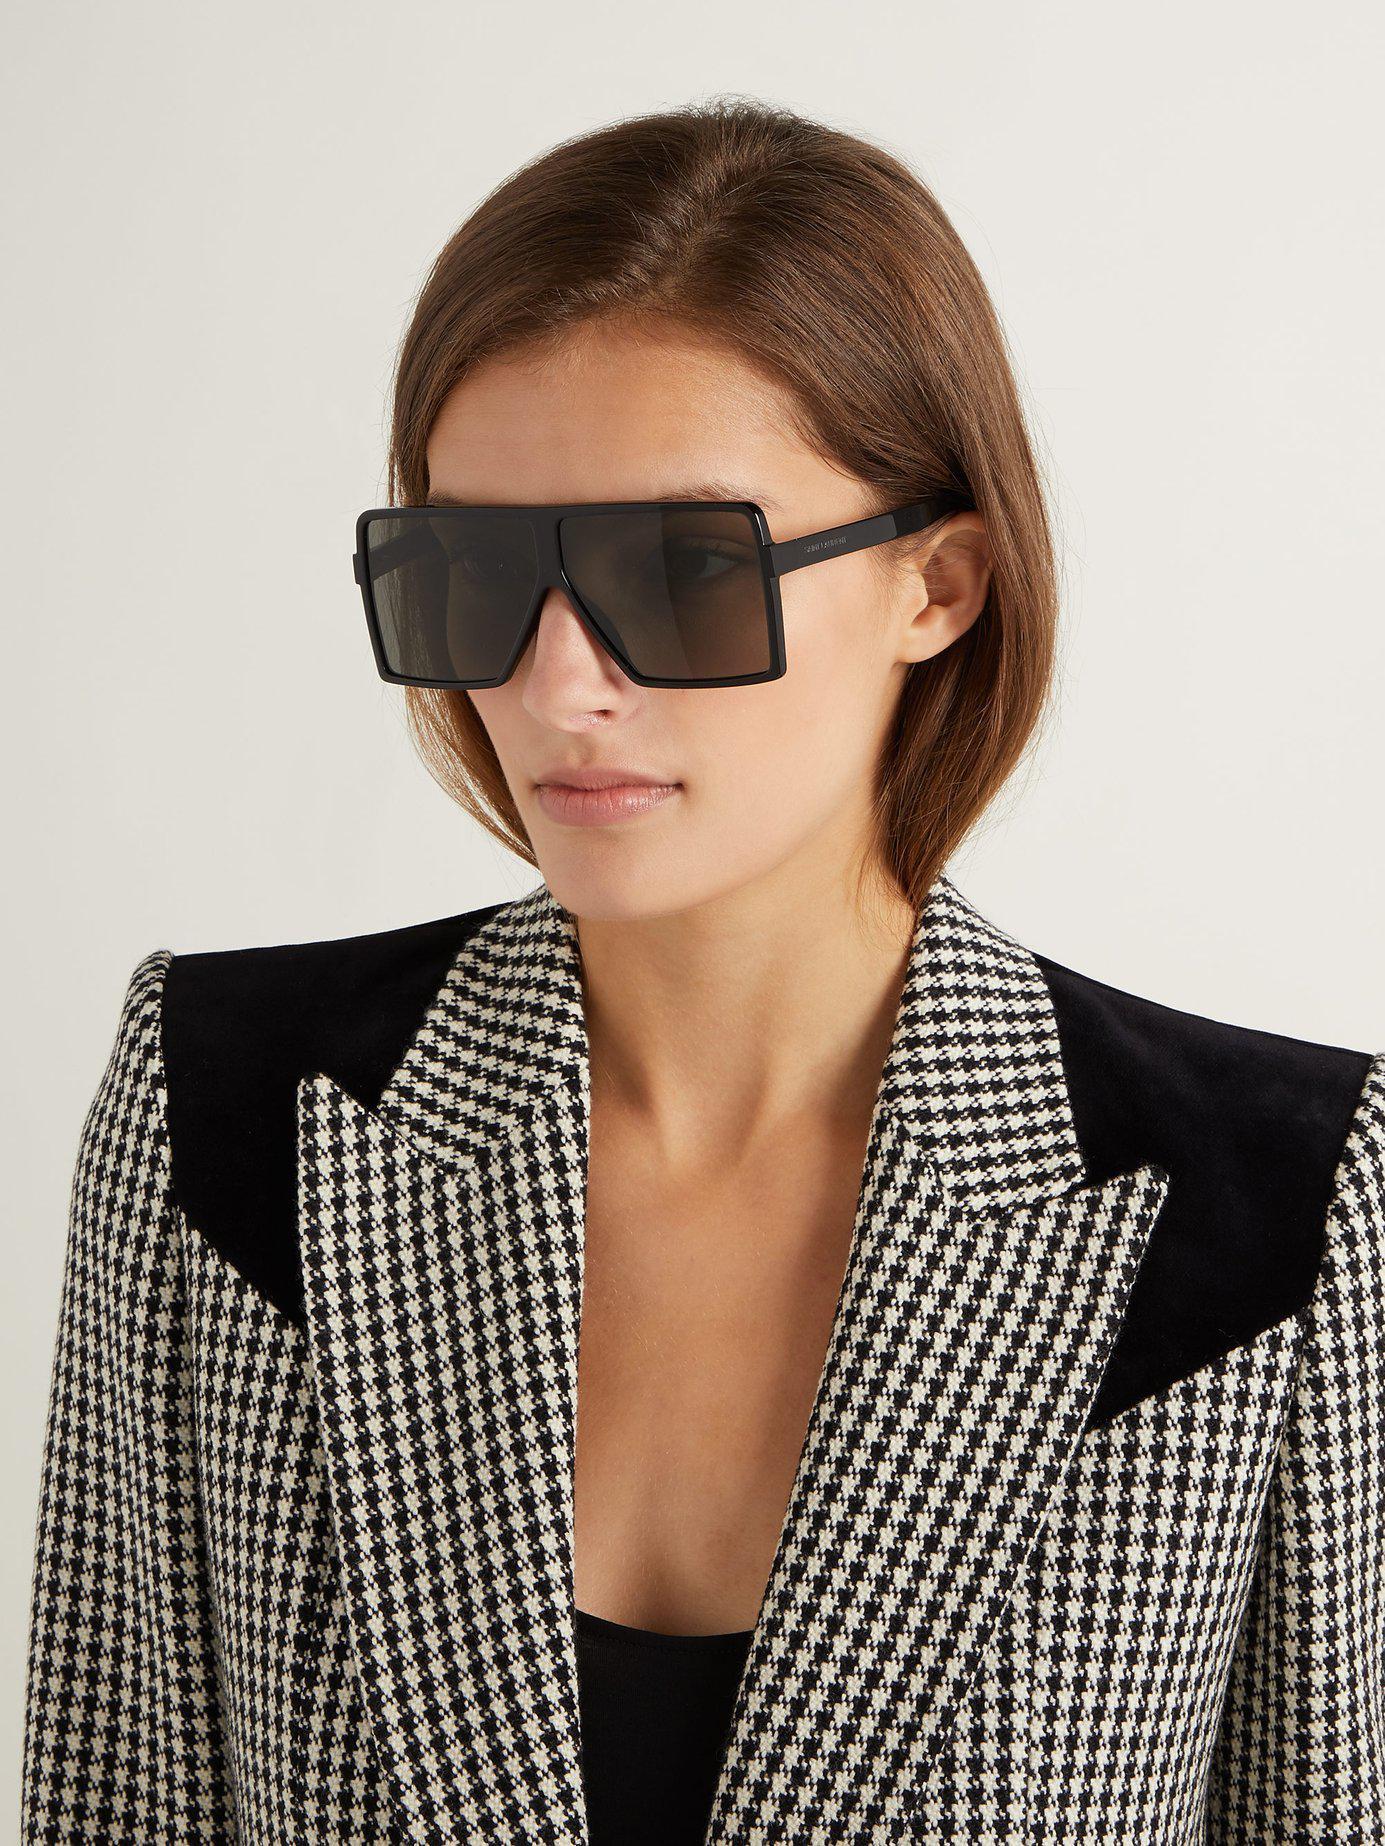 Sunglasses Black Lyst Laurent Saint Acetate Top Betty Flat qwBWYw5zx0